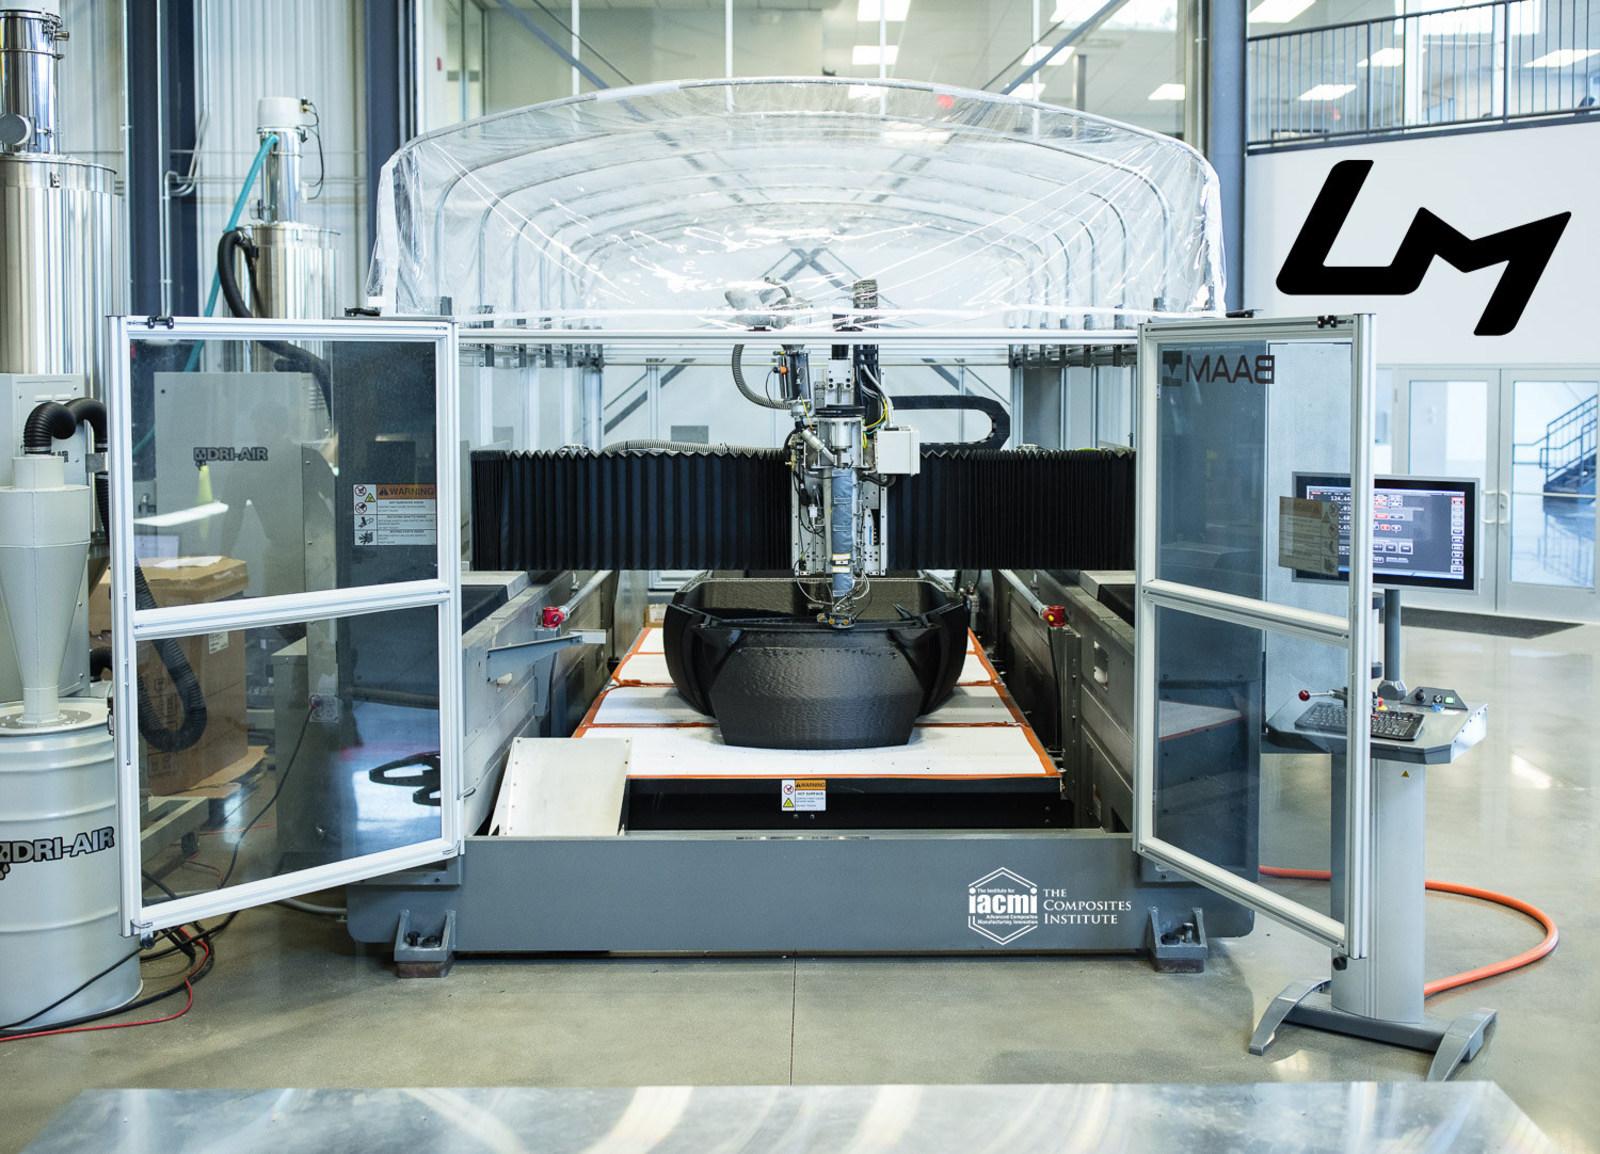 ORNL's A Big Area Additive Manufacturing (BAAM) machine in use to print the Strati car. Photo via IACMI